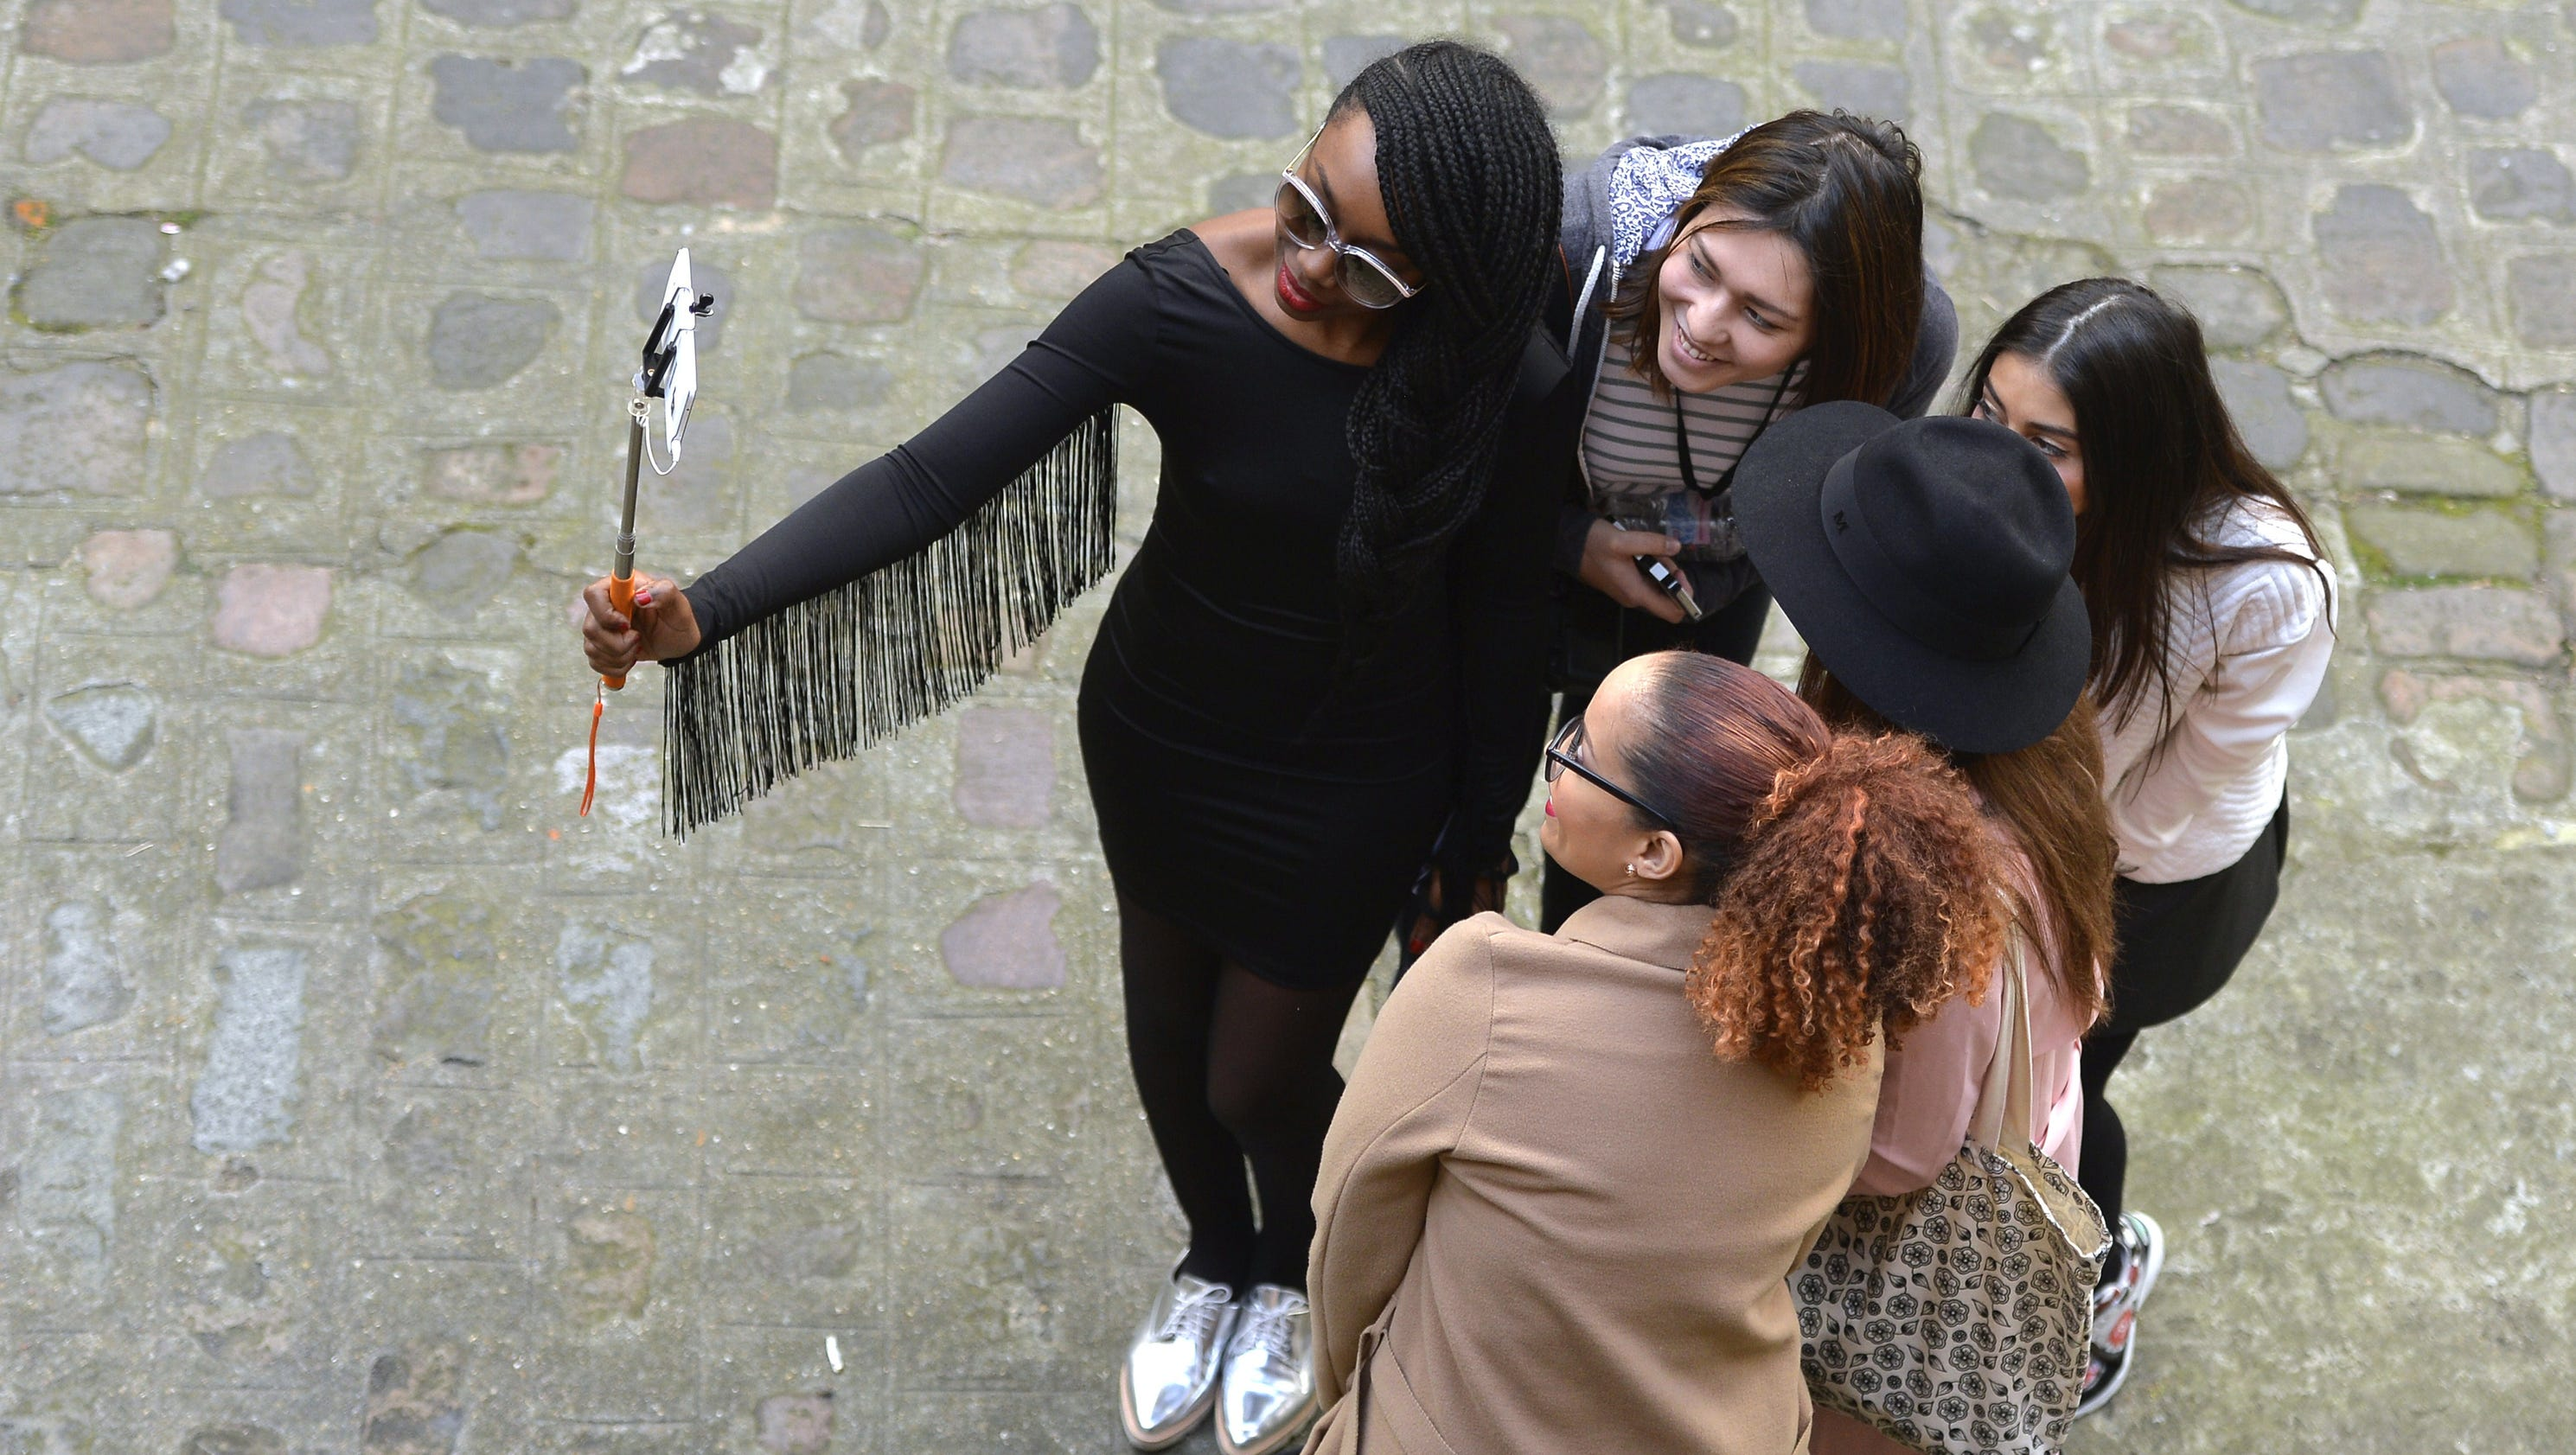 french uk attractions ban selfie sticks. Black Bedroom Furniture Sets. Home Design Ideas